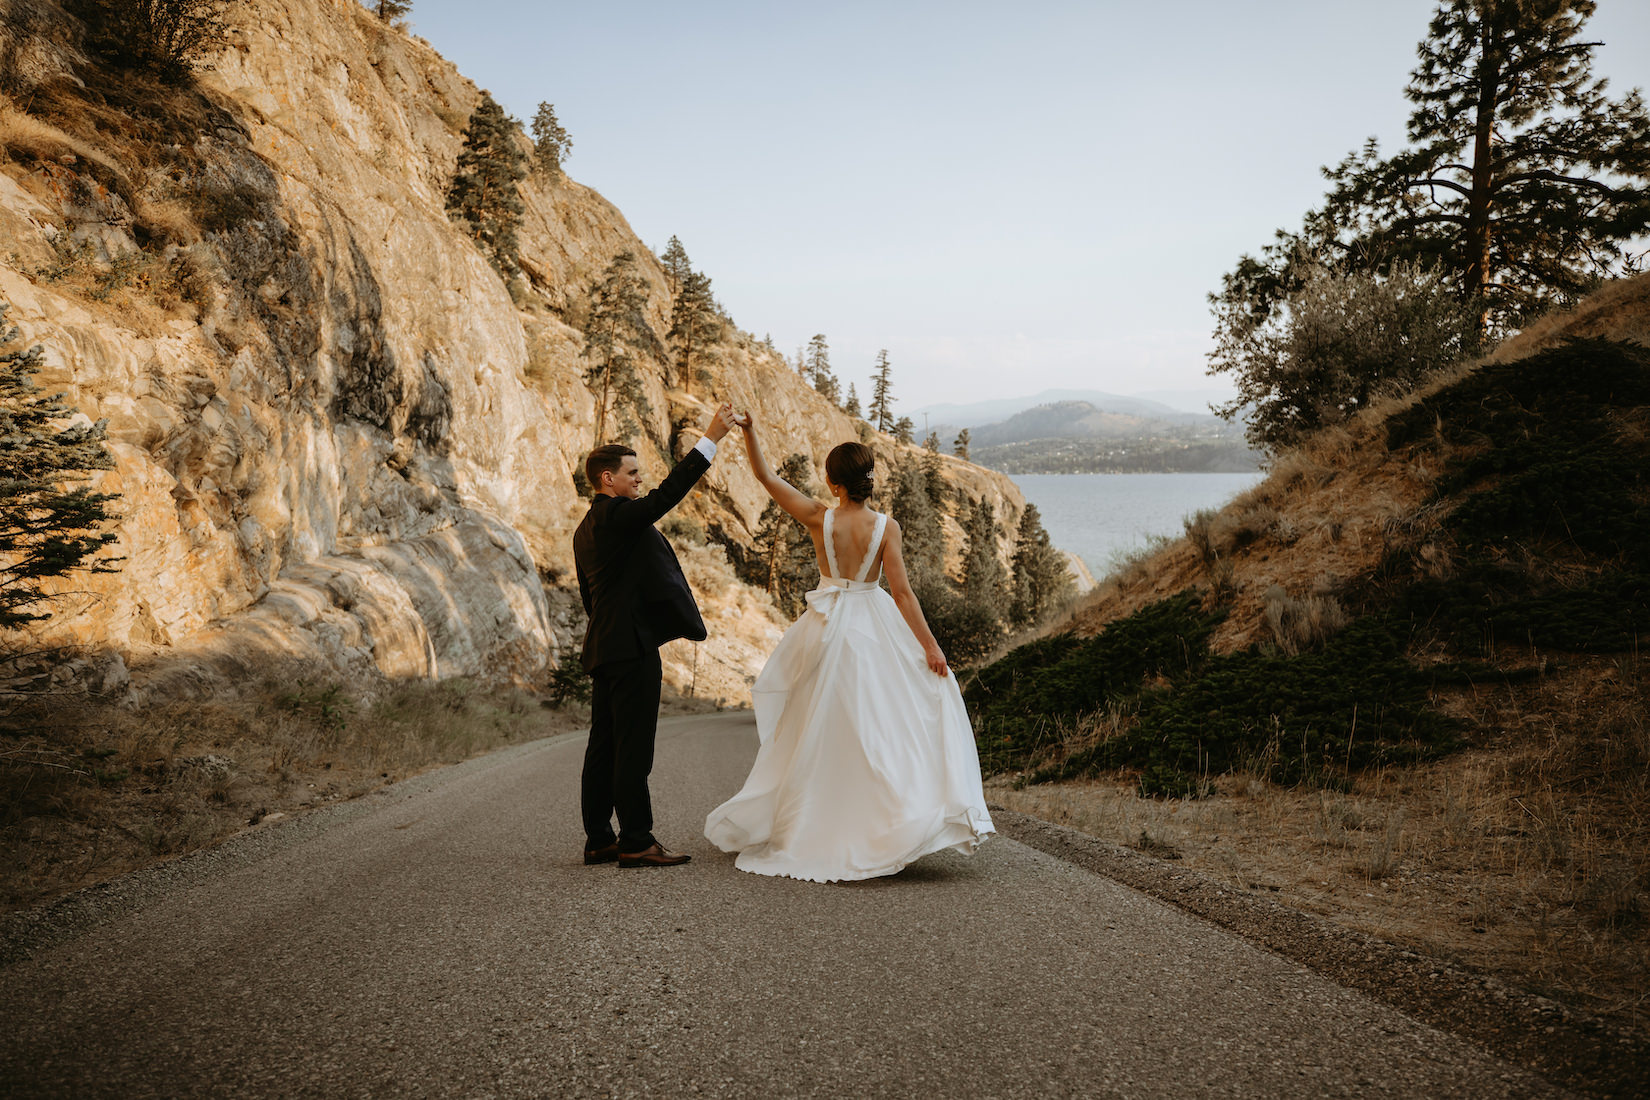 Gods-mountain-estate-weddings-34.jpg